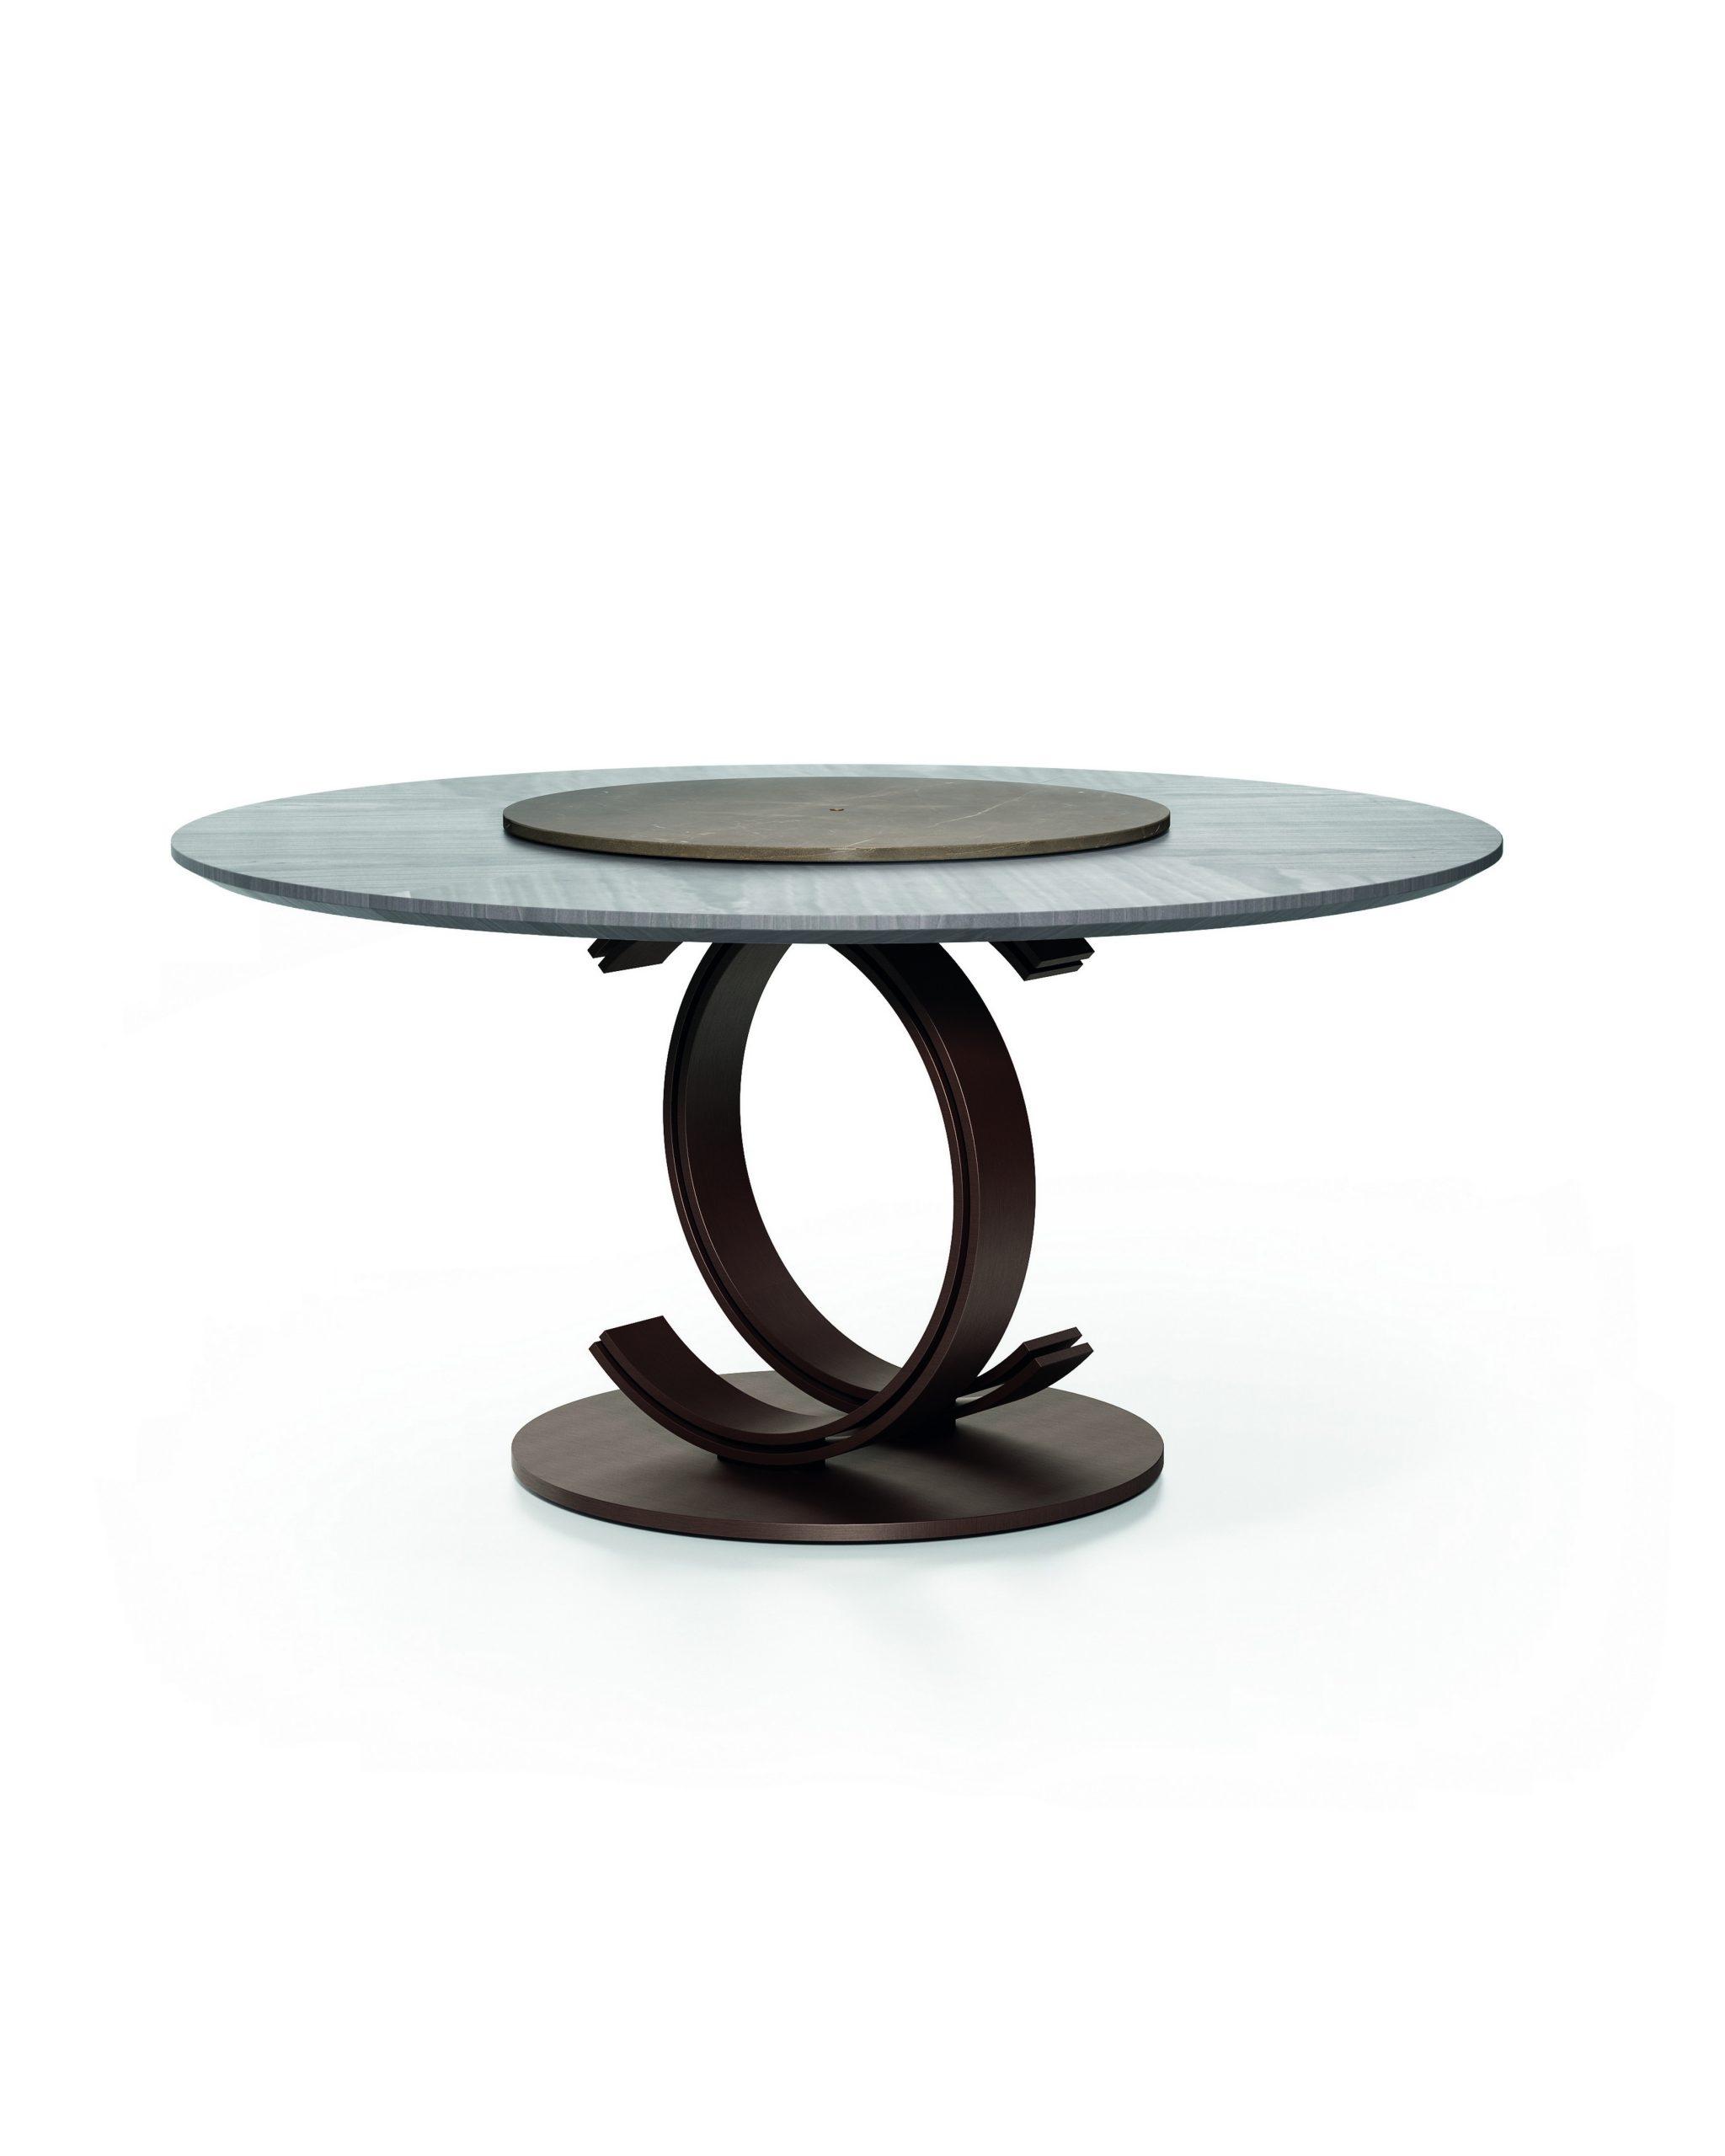 Blue Moon餐檯/餐枱/餐桌 dining table